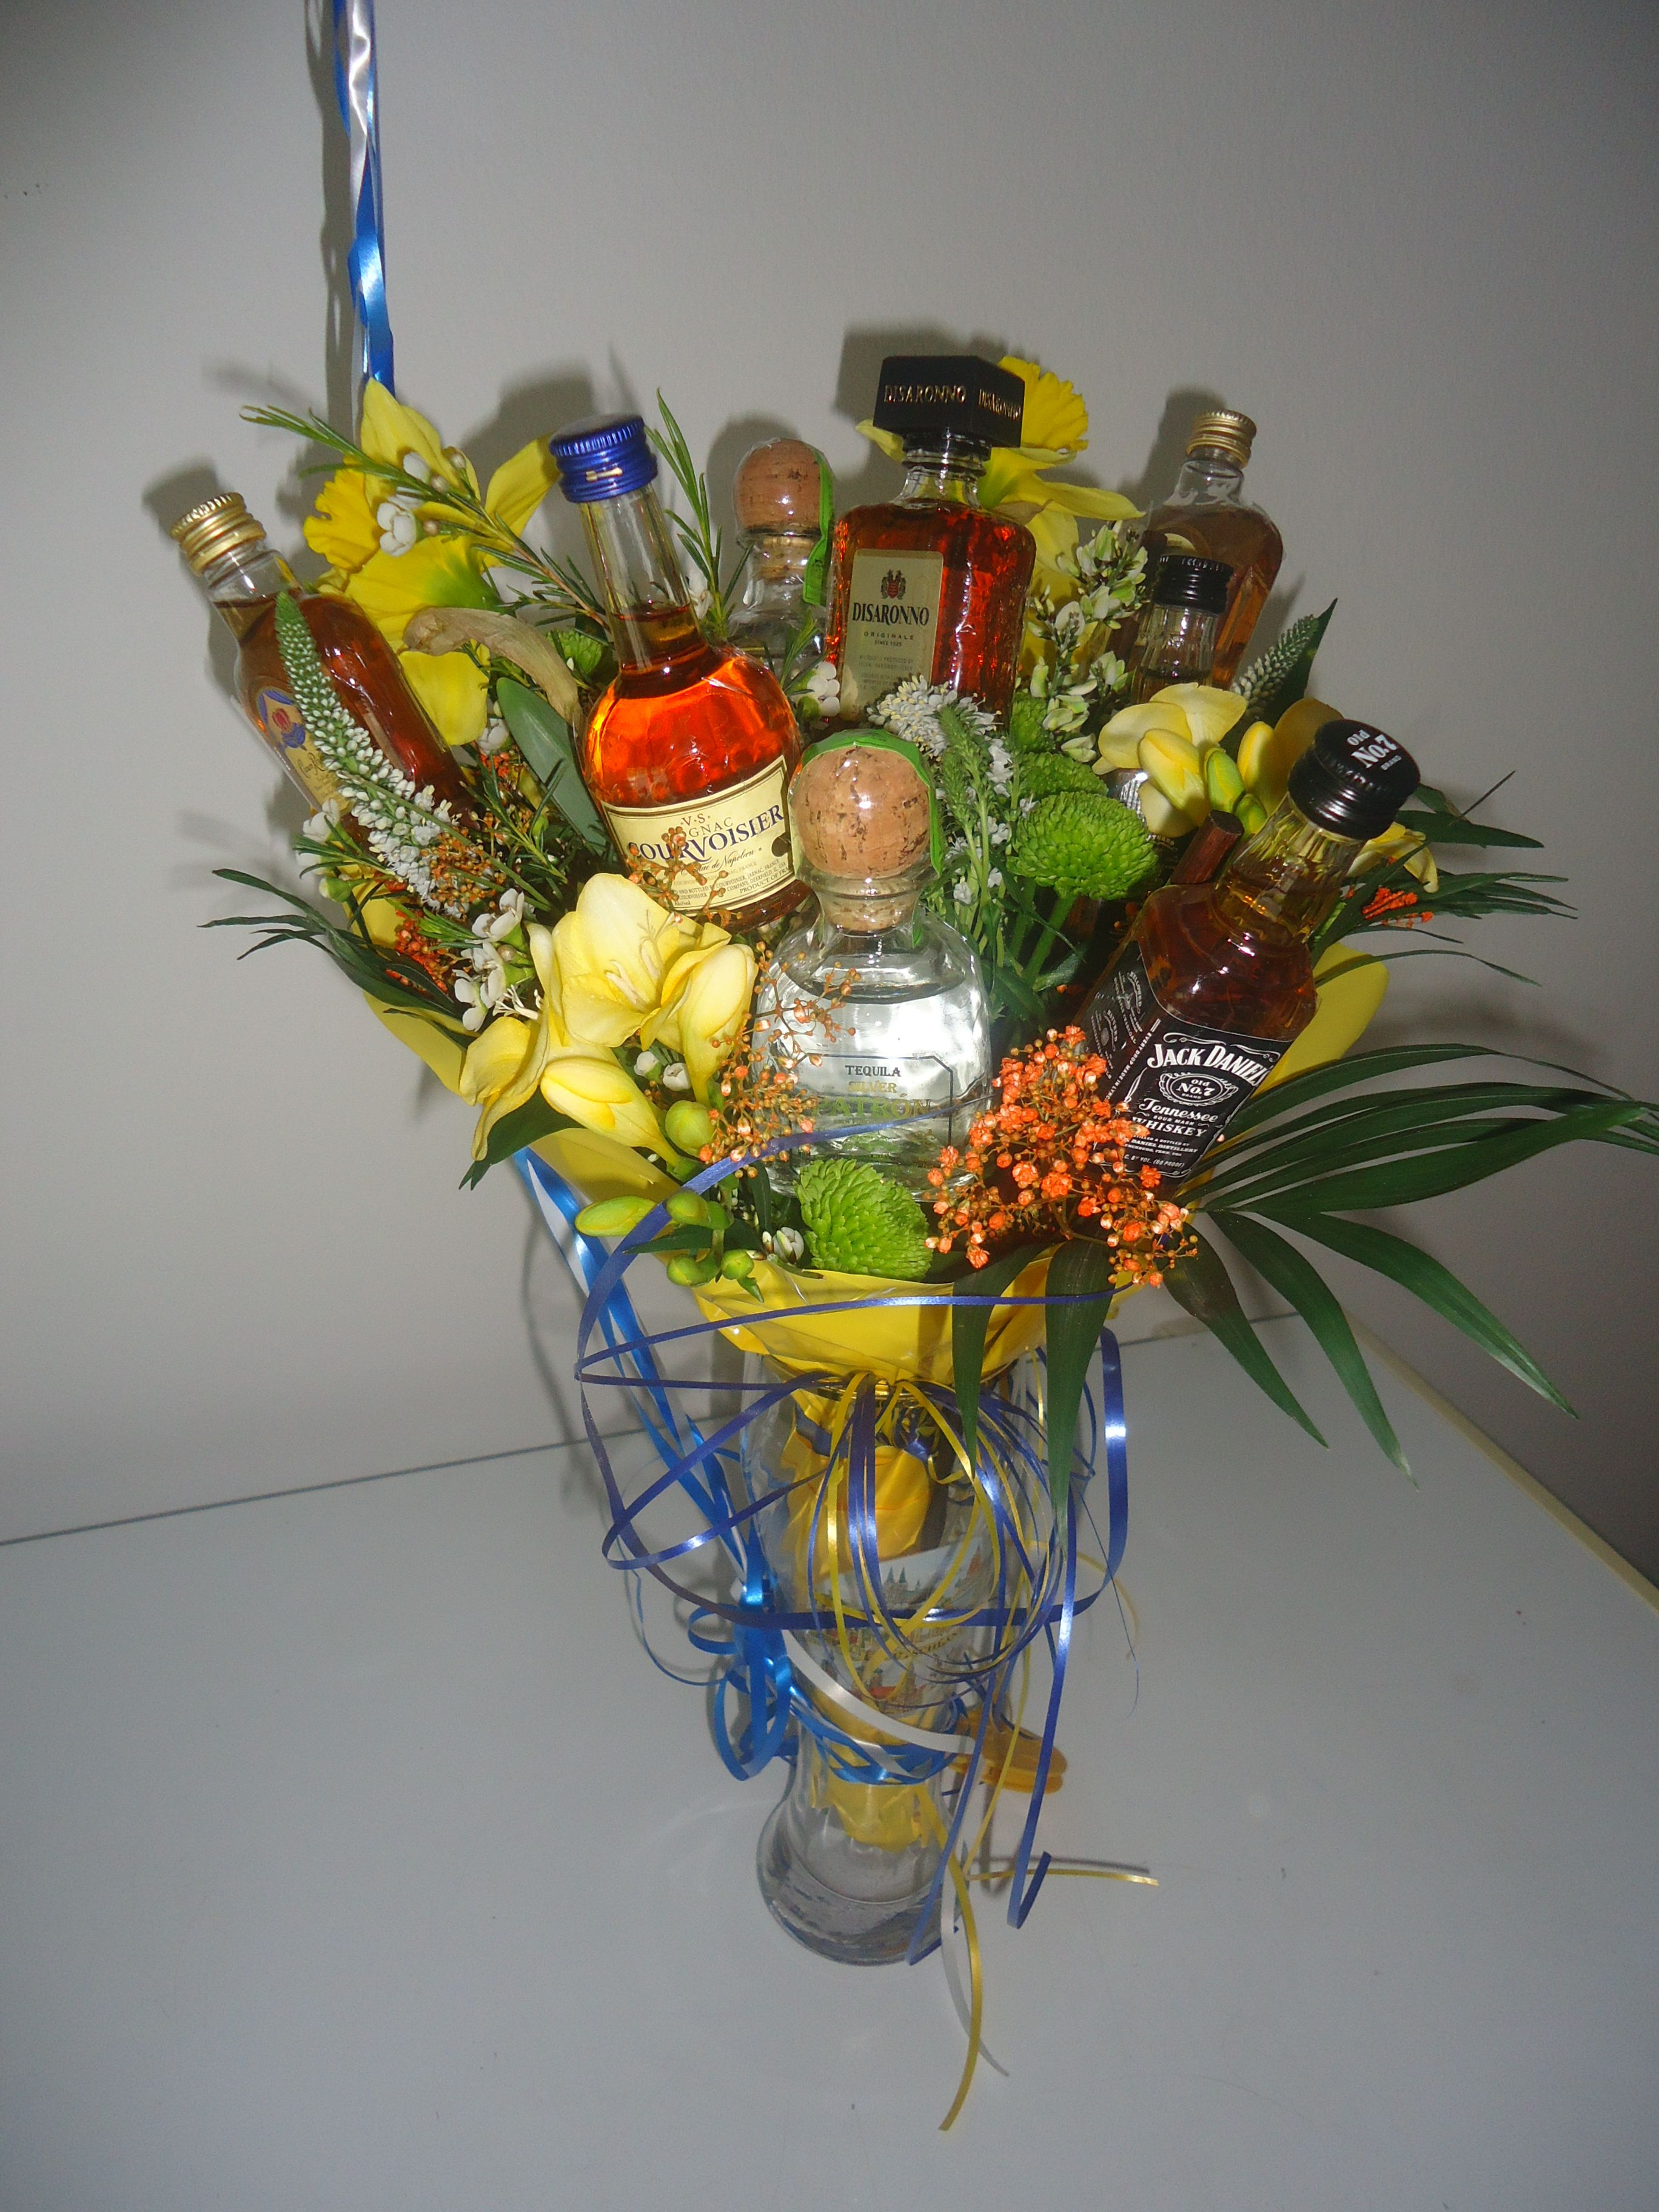 Pin By Breanne Tilley Ericks On Stuff I Make Diy Xmas Gifts Flowers For Men Husband Birthday